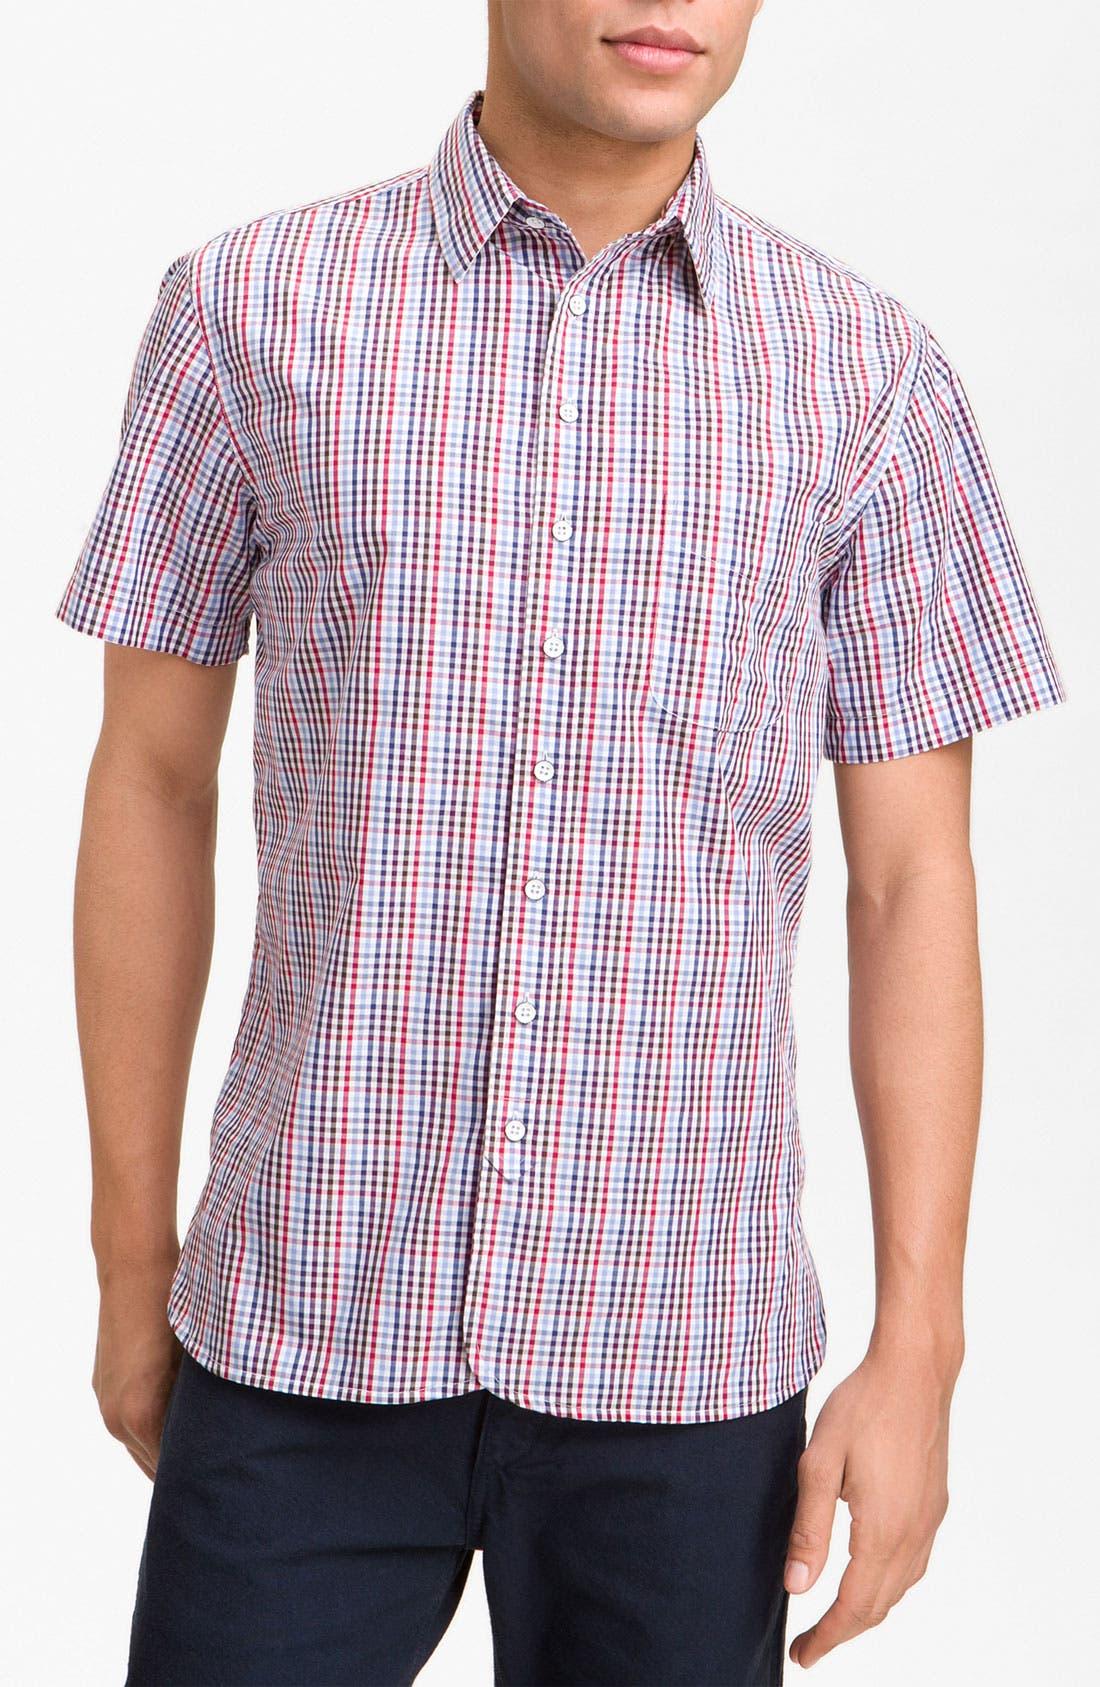 Alternate Image 1 Selected - rag & bone Check Woven Shirt